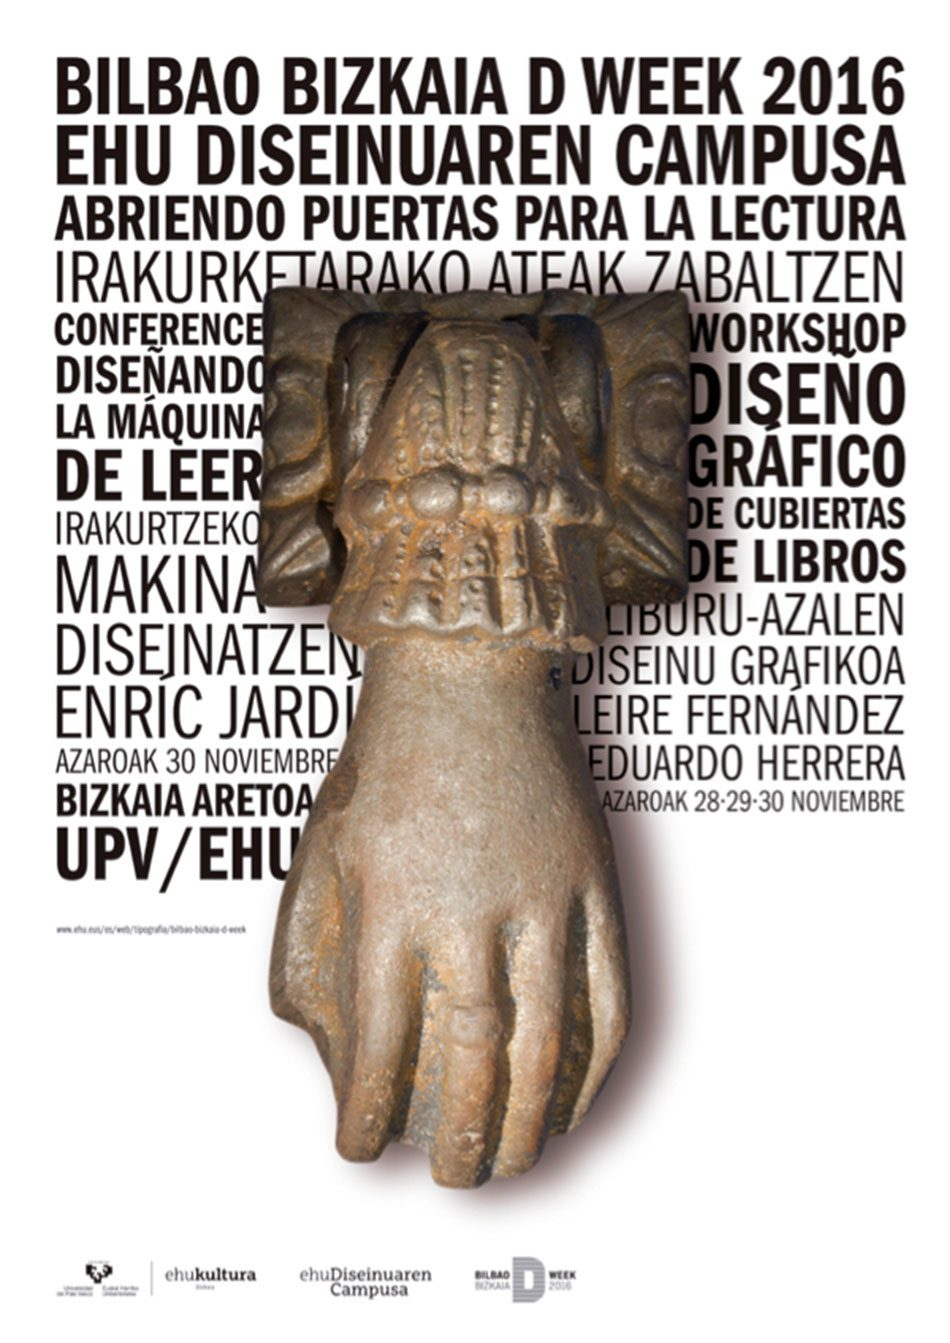 Bilbao Bizkaia D Week 2016 1